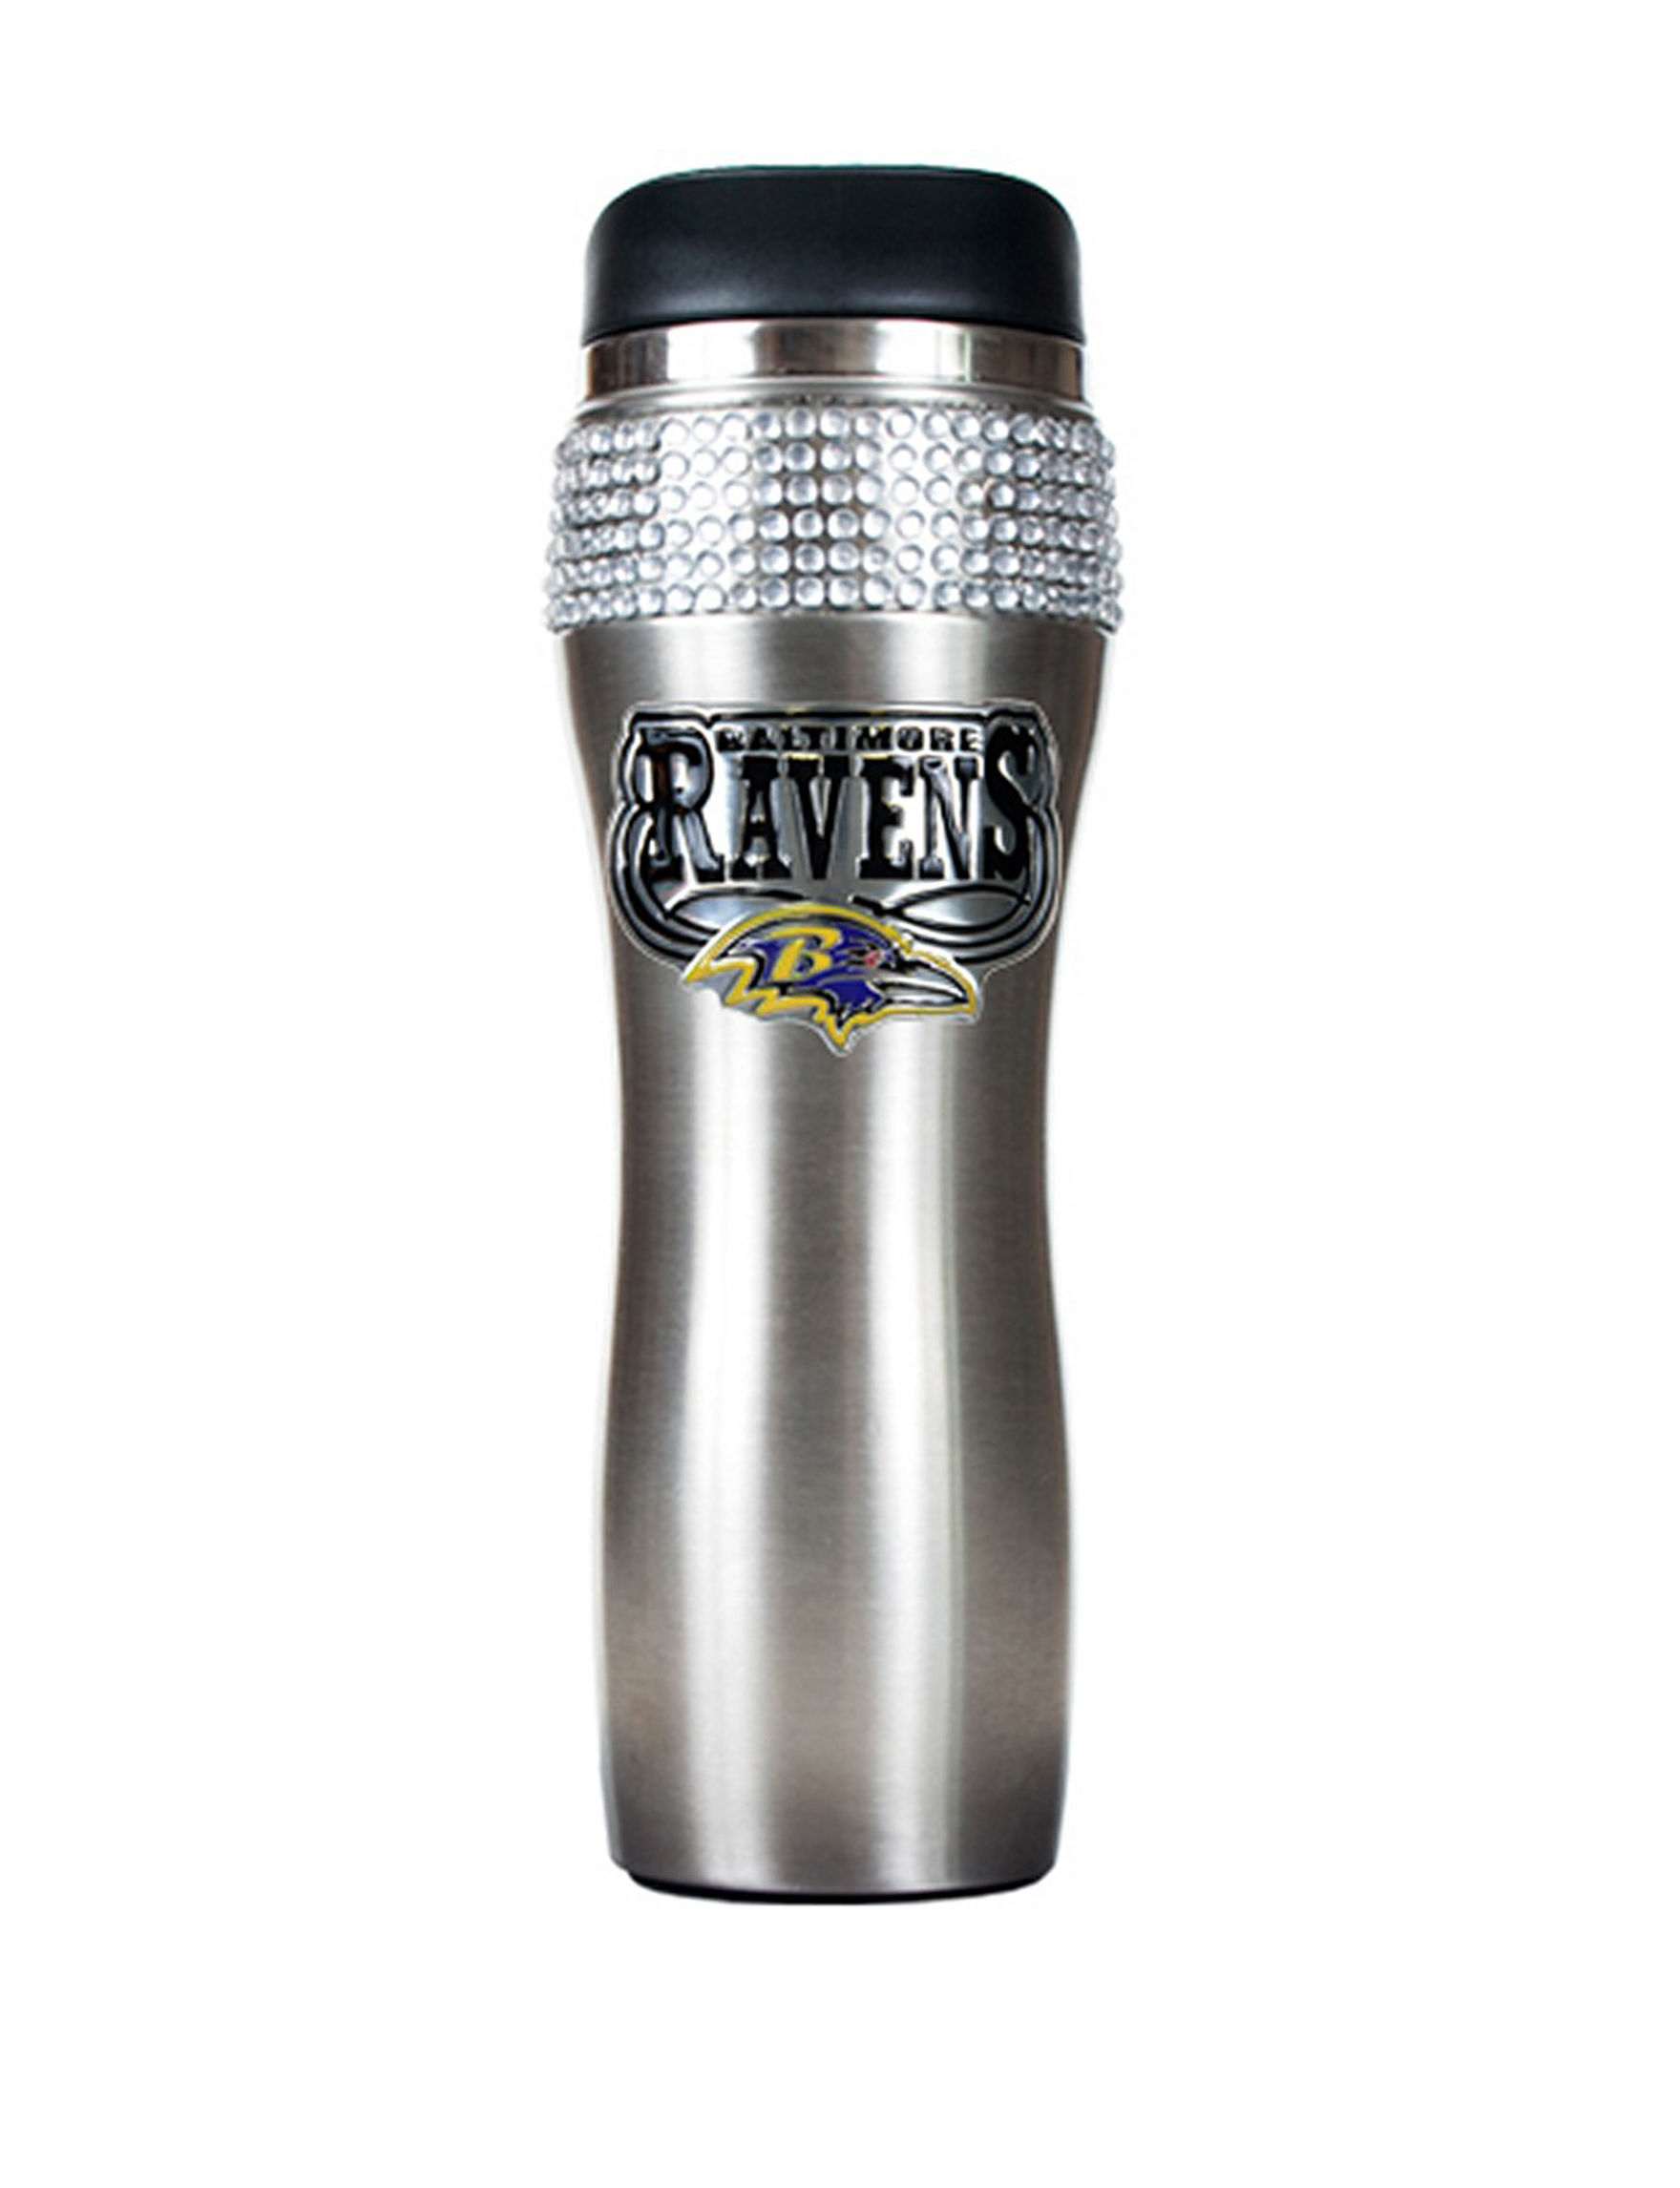 NFL Silver Tumblers Drinkware NFL